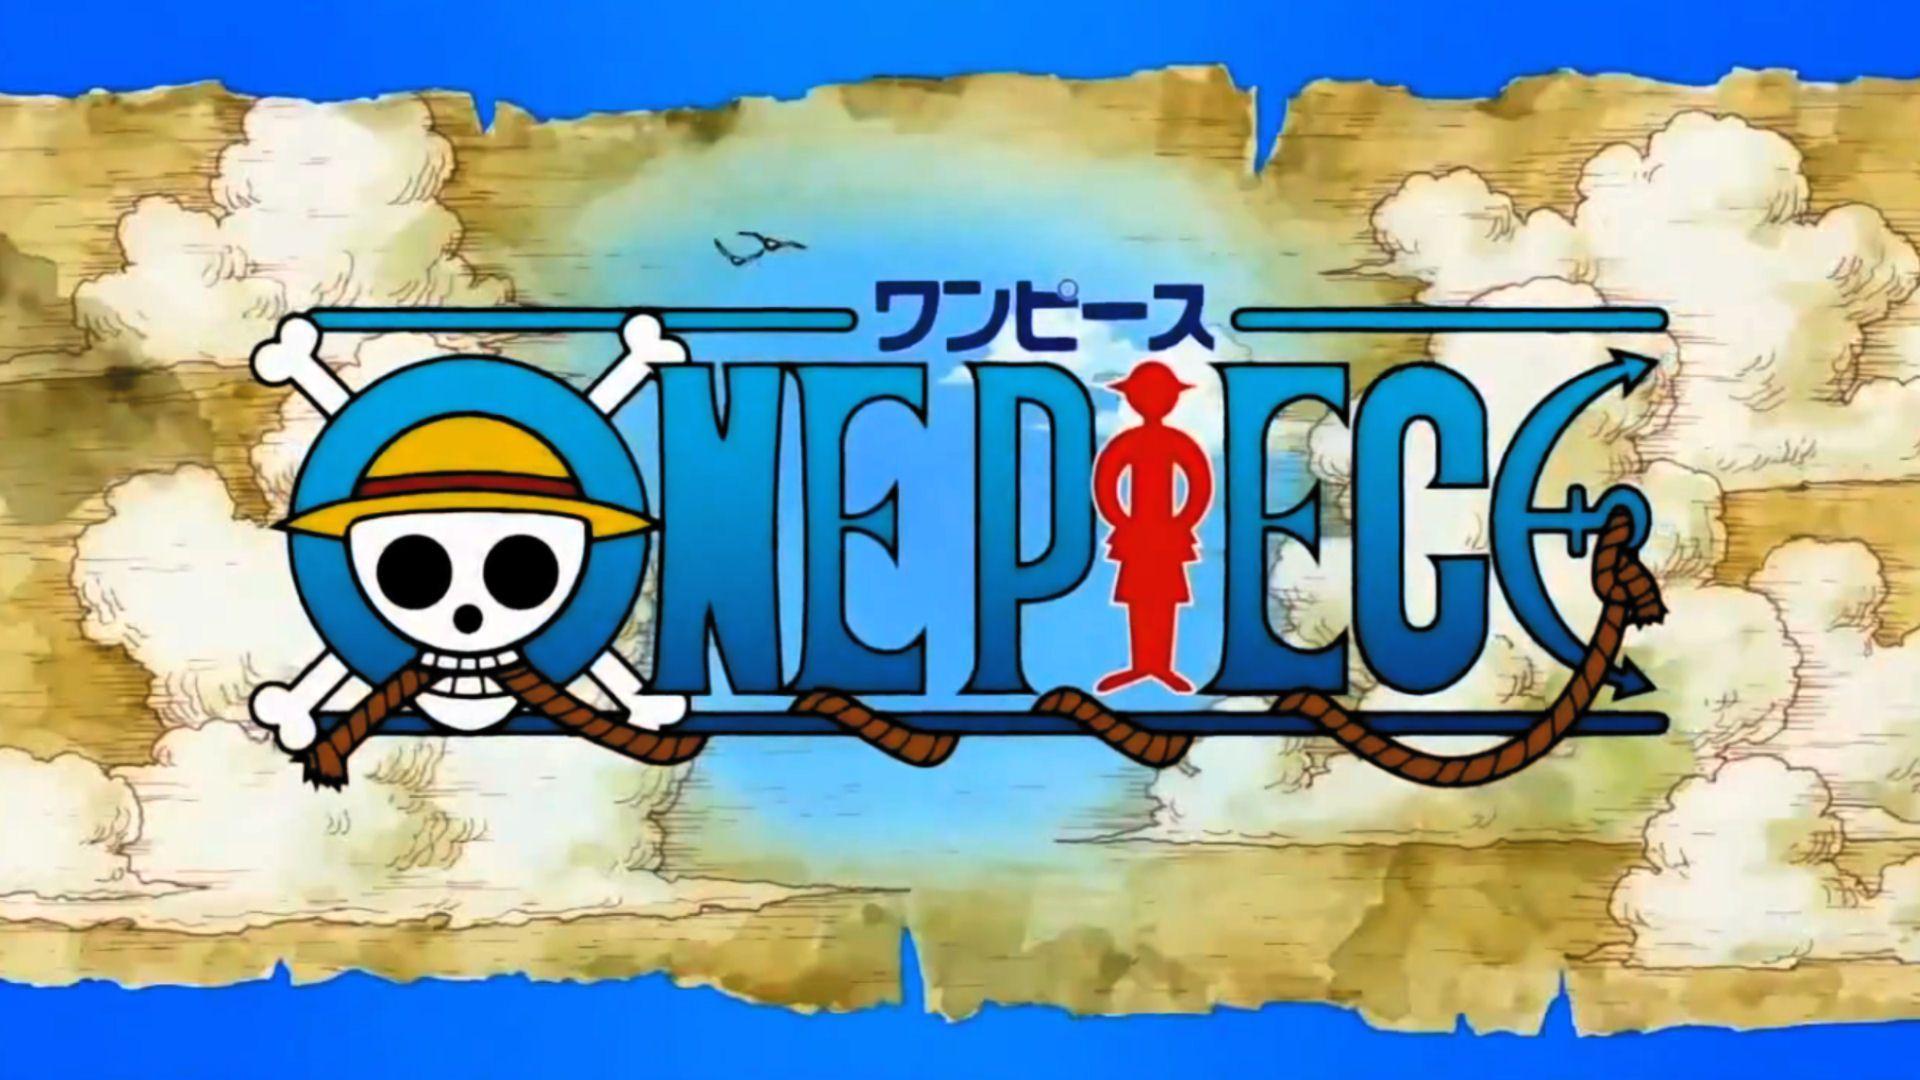 Portrait One Piece Wallpapers Top Free Portrait One Piece Backgrounds Wallpaperaccess